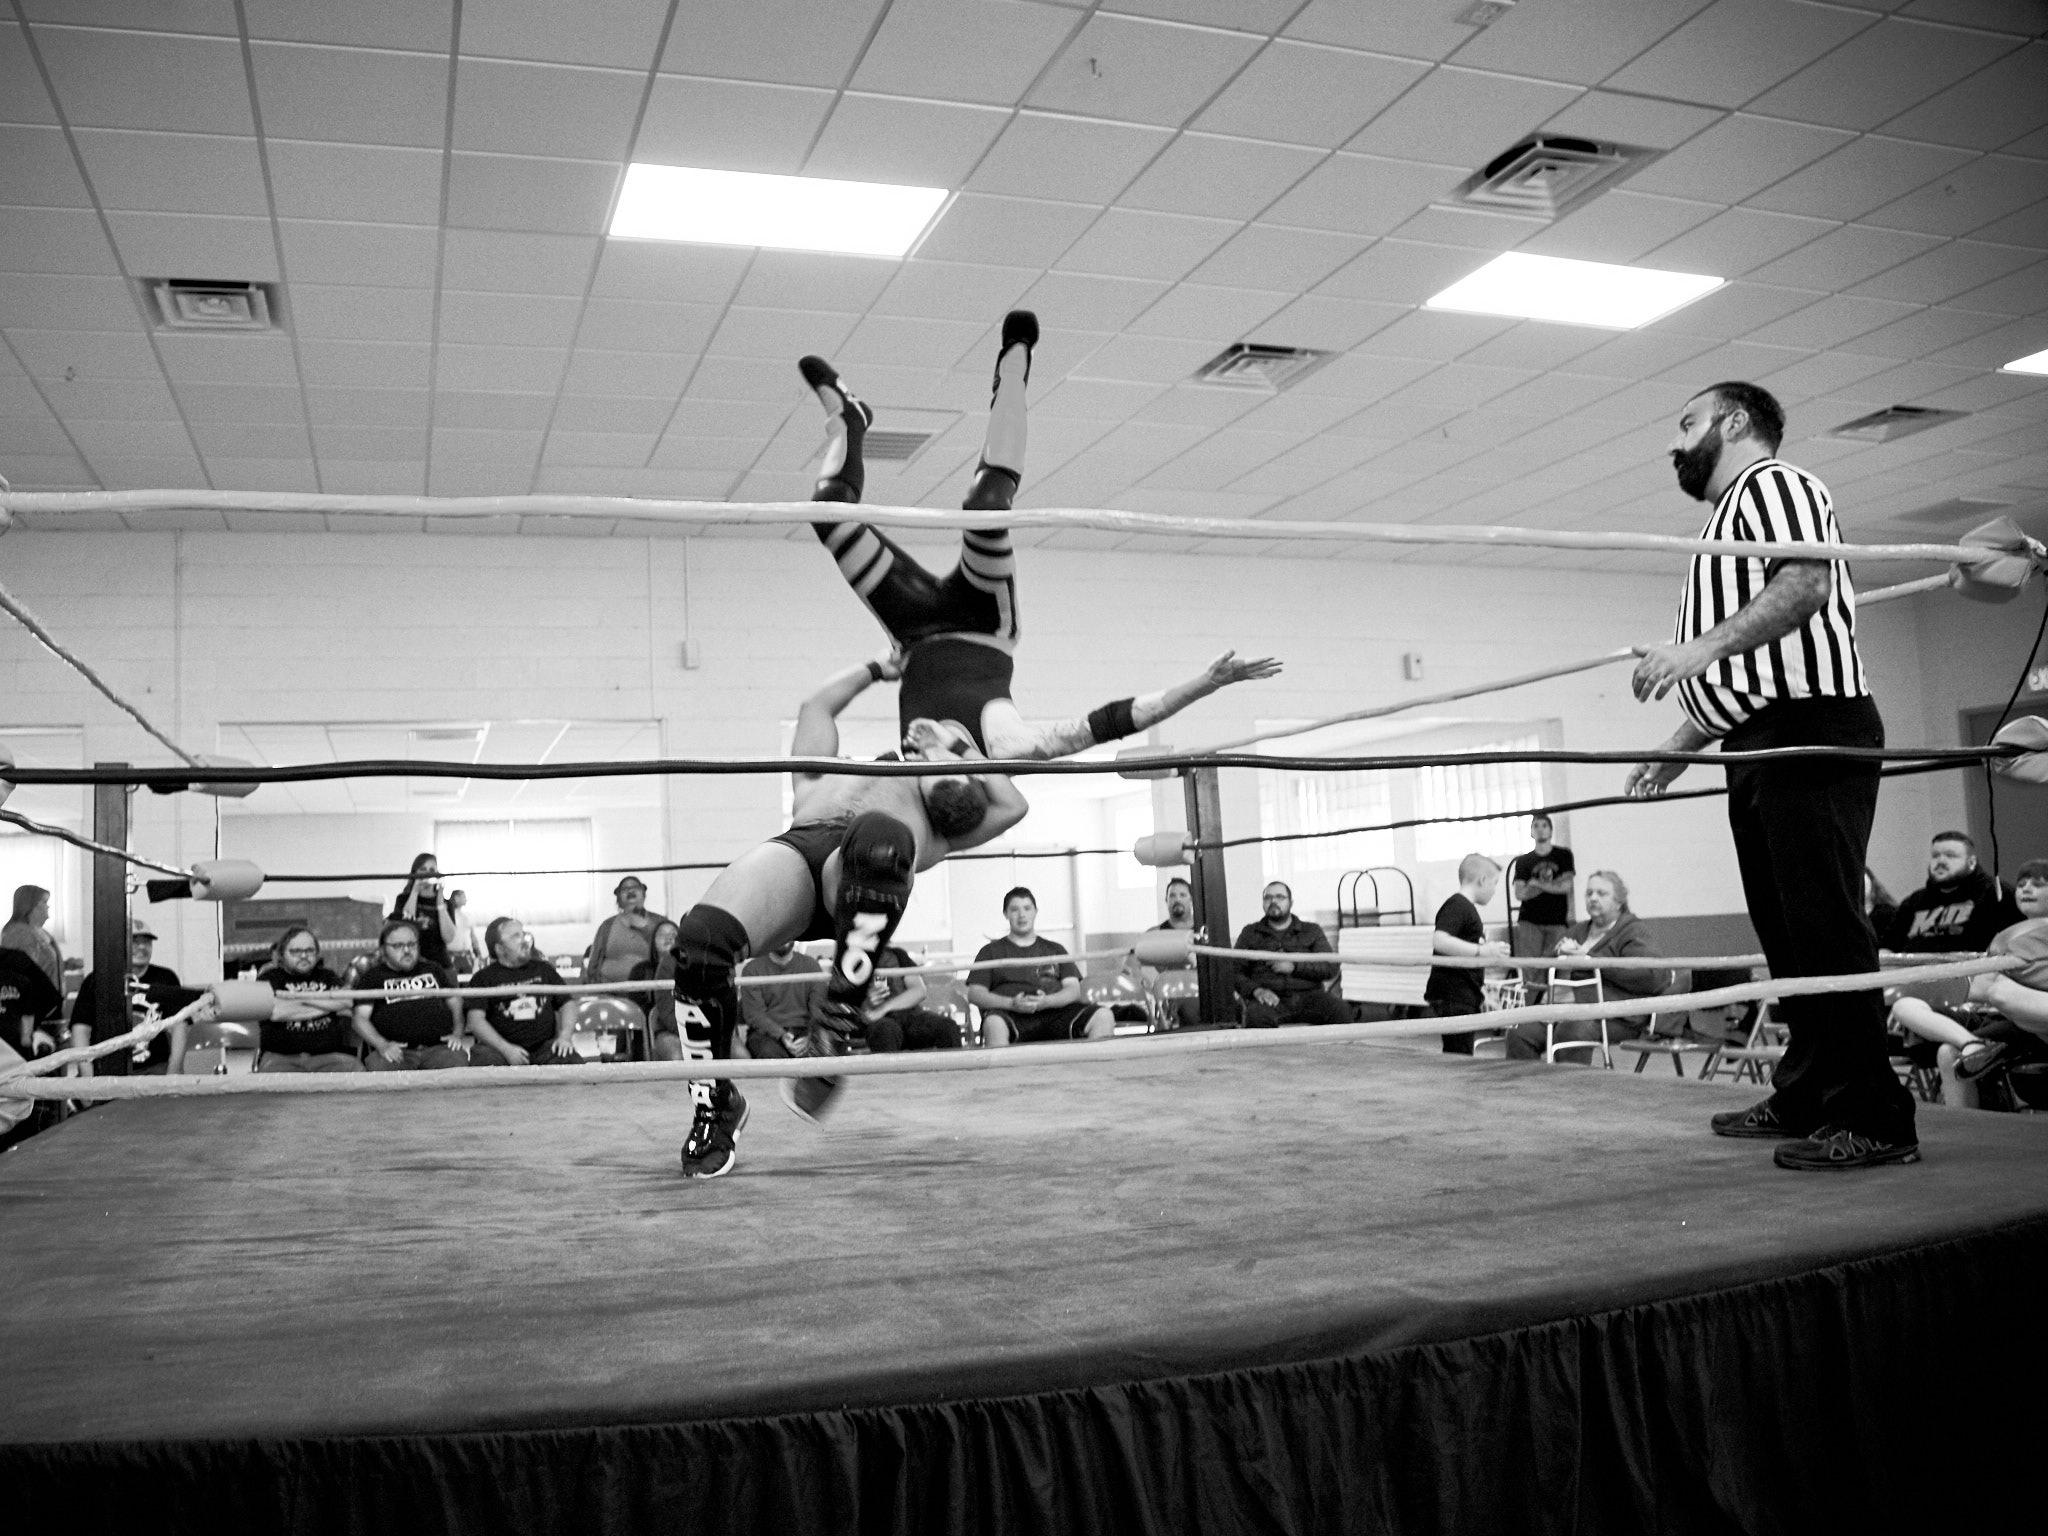 wrestling_may2019_004.jpg